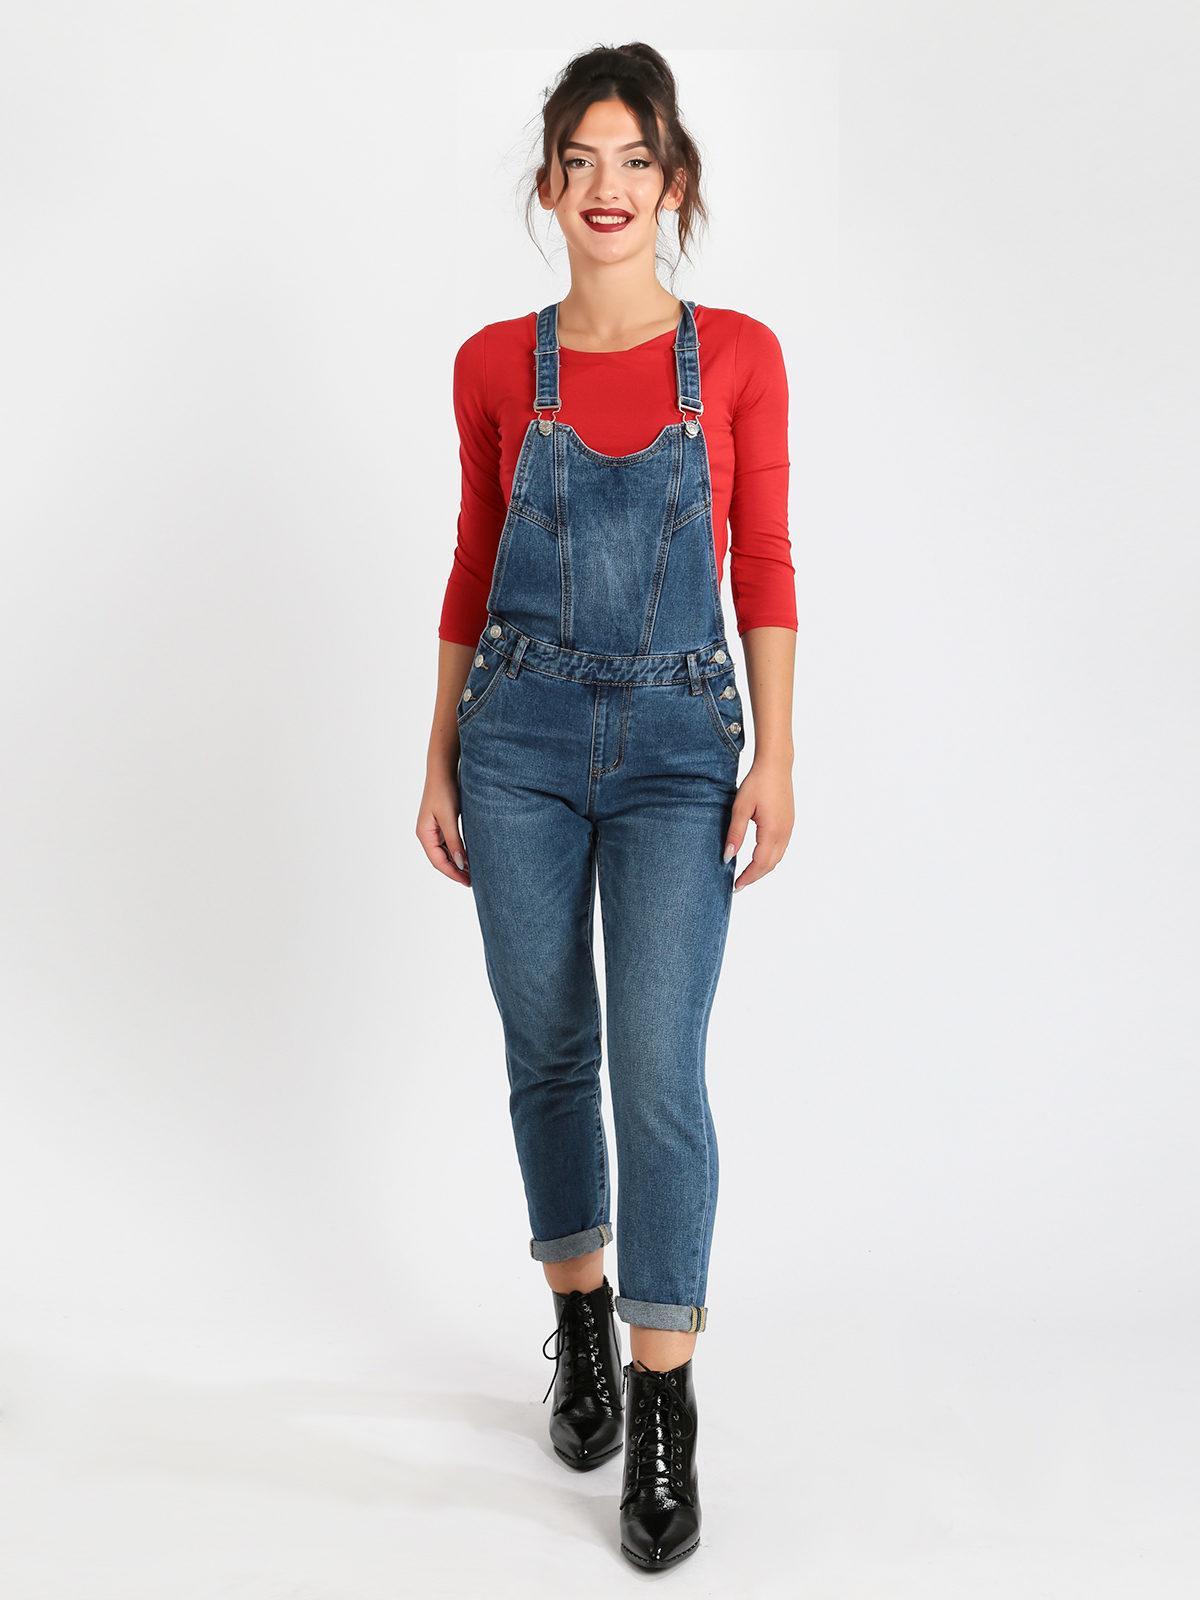 new product 0bfab 7e480 Salopette di jeans baggy solada | MecShopping